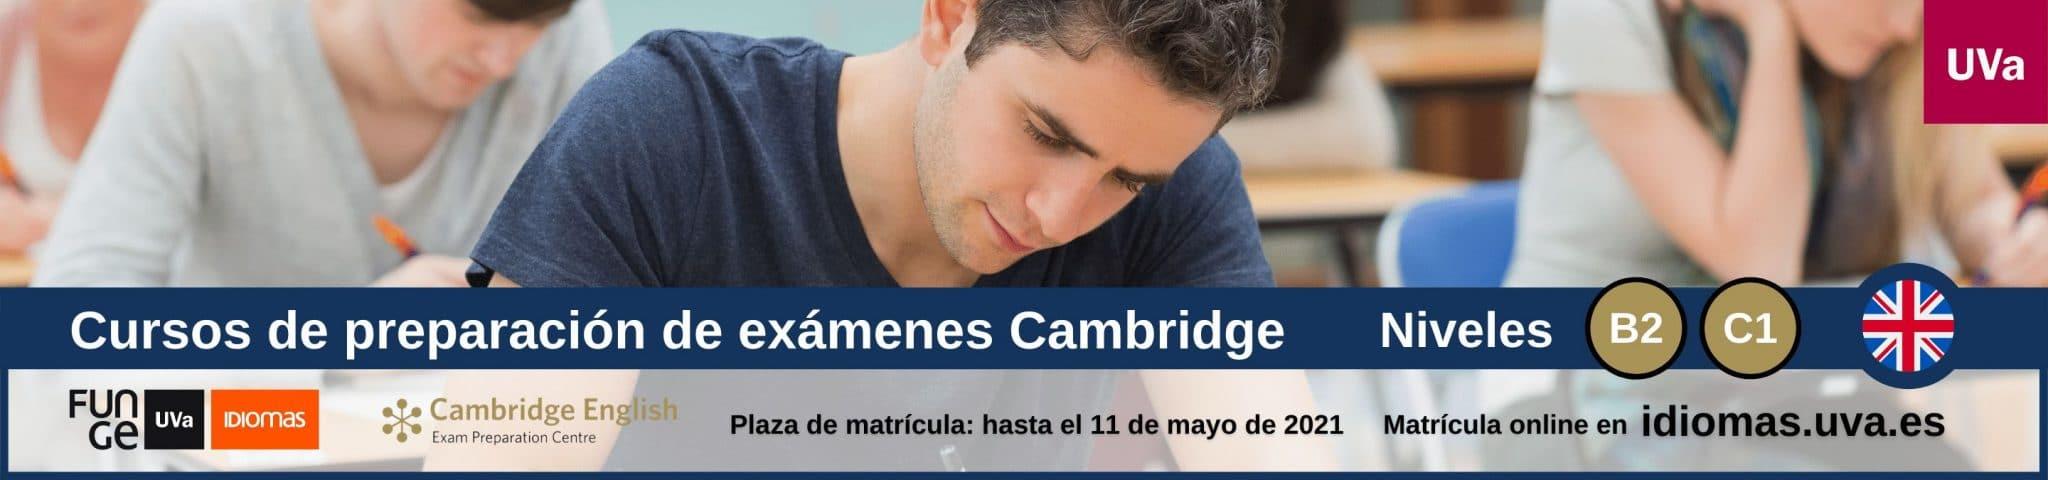 Banner cursos preparacion First Advanced Cambridge mayo junio julio 2021 Centro de Idiomas UVa 2048x480 1